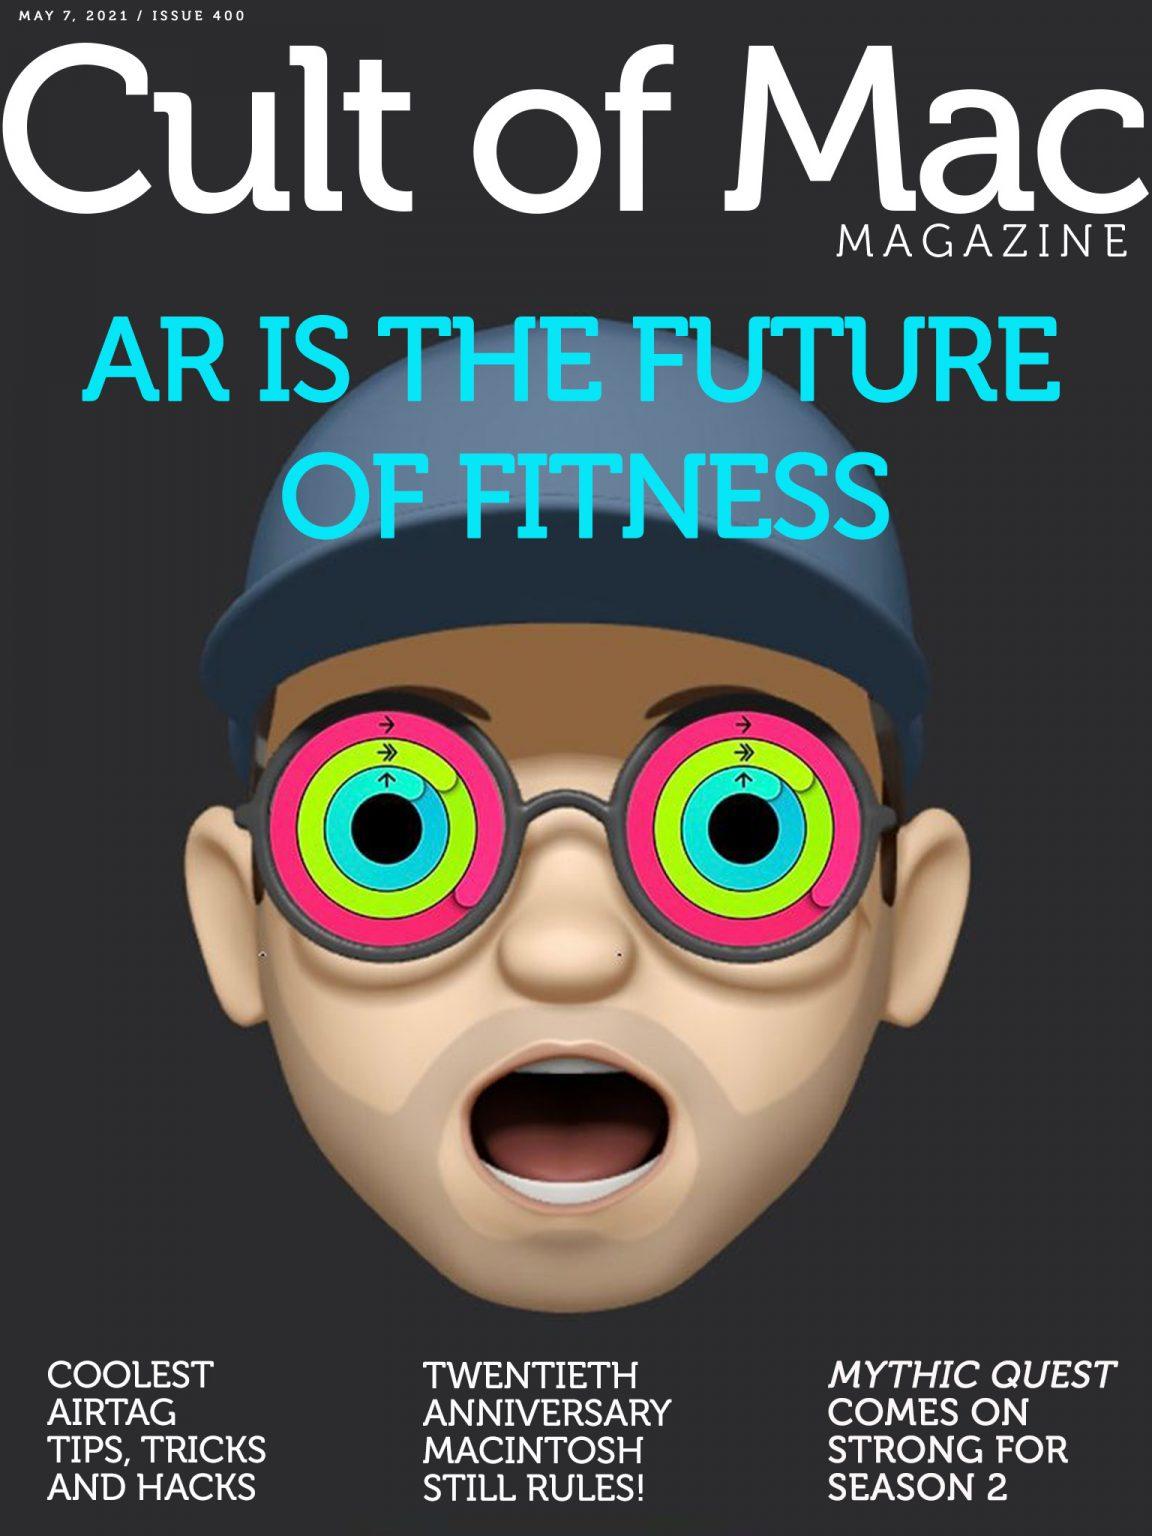 Apple AR glasses will turbocharge fitness.